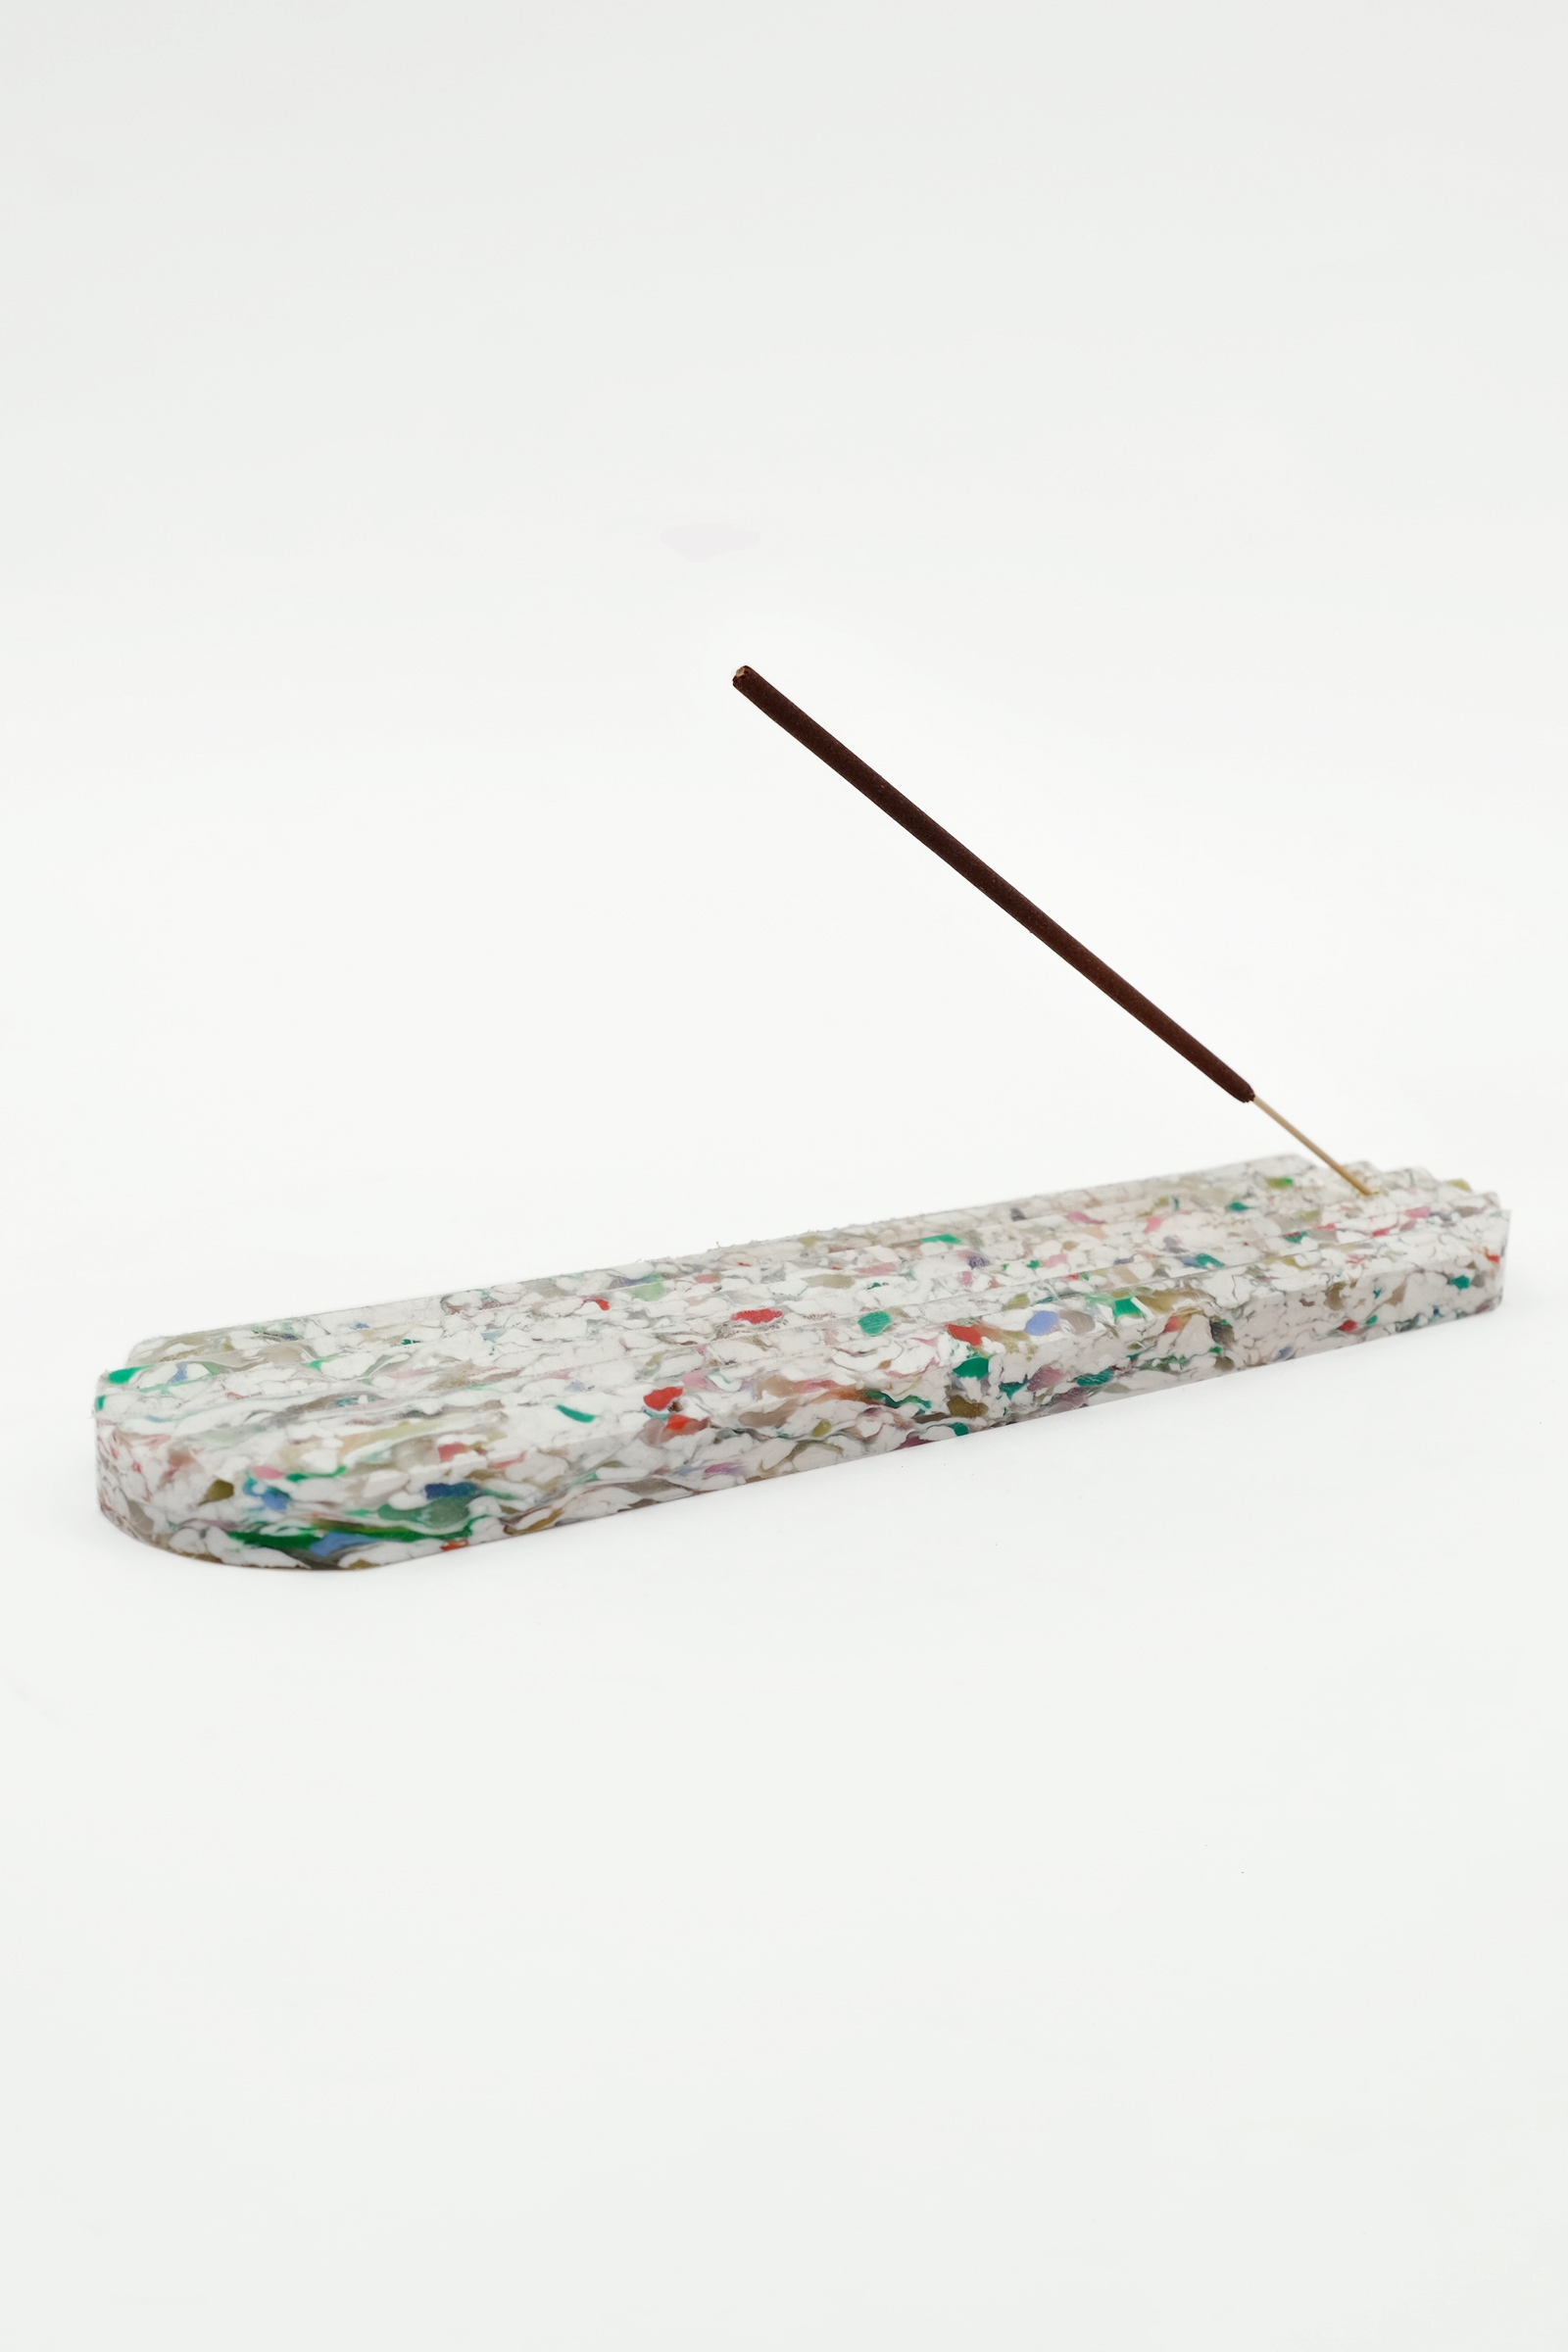 Picture of Kivee X Adieu Living Bundling Soft Touch + Wasteful Land Holder